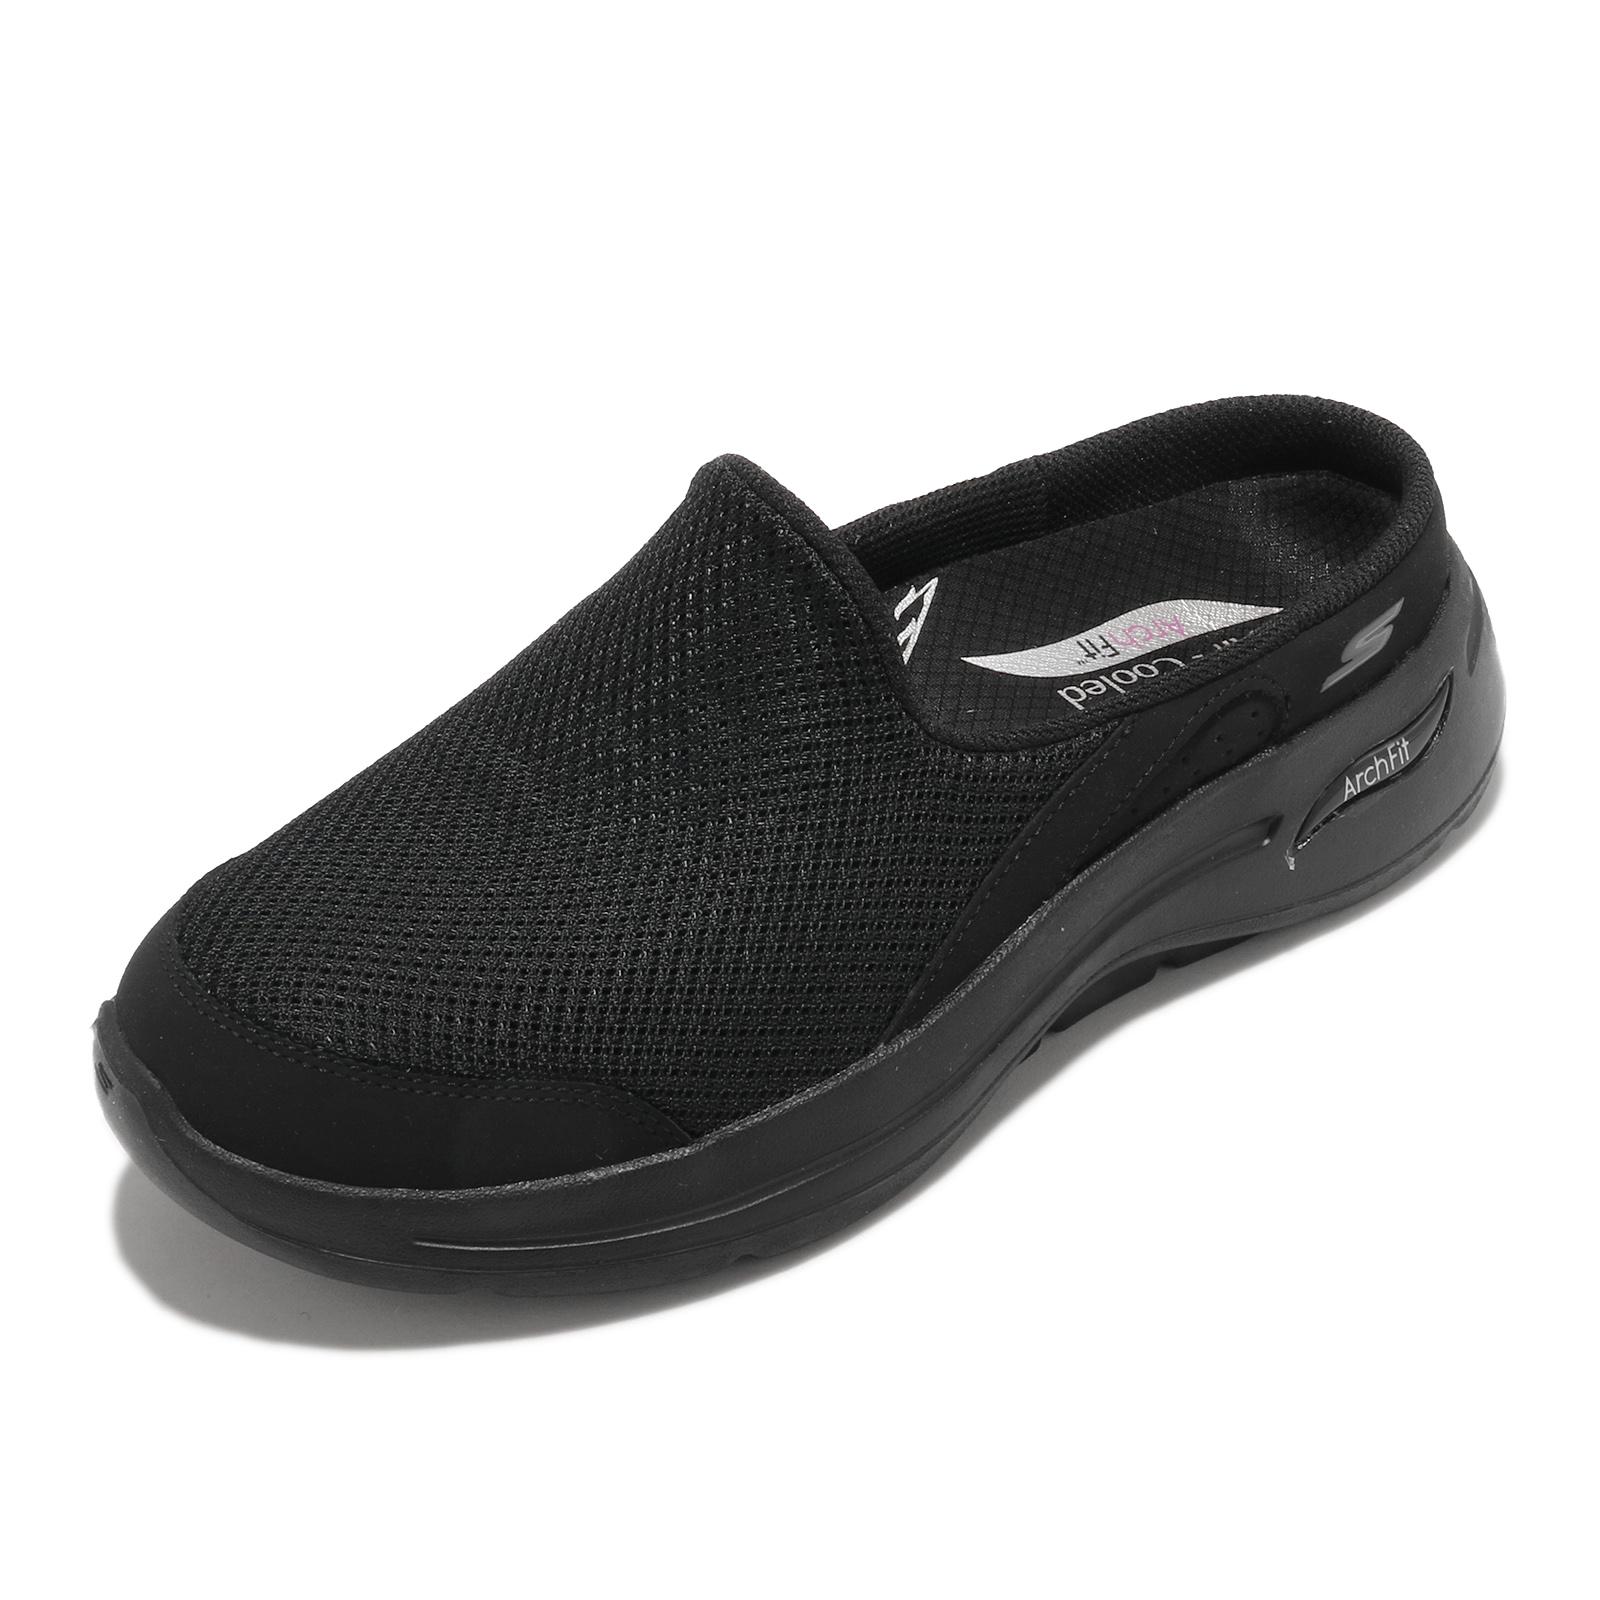 Skechers 拖鞋 Go Walk Arch Fit 女鞋 全黑 足弓支撐 穆勒鞋 【ACS】 124481-BBK